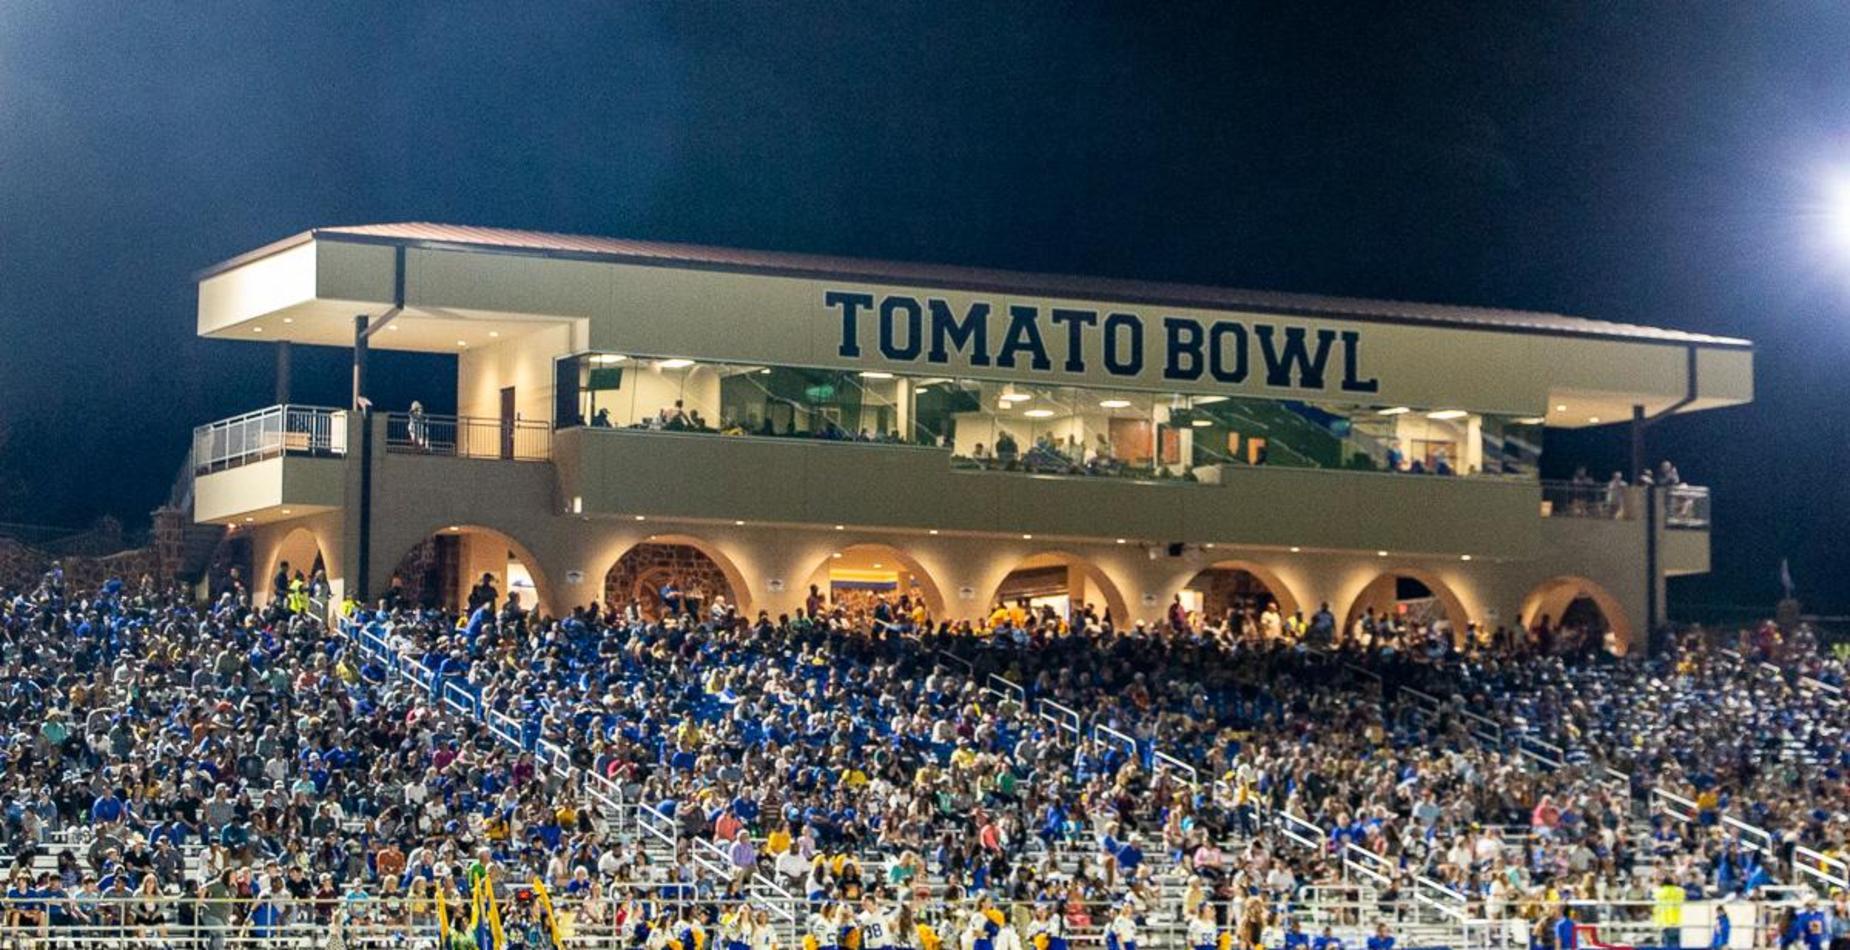 Tomato Bowl Stadium